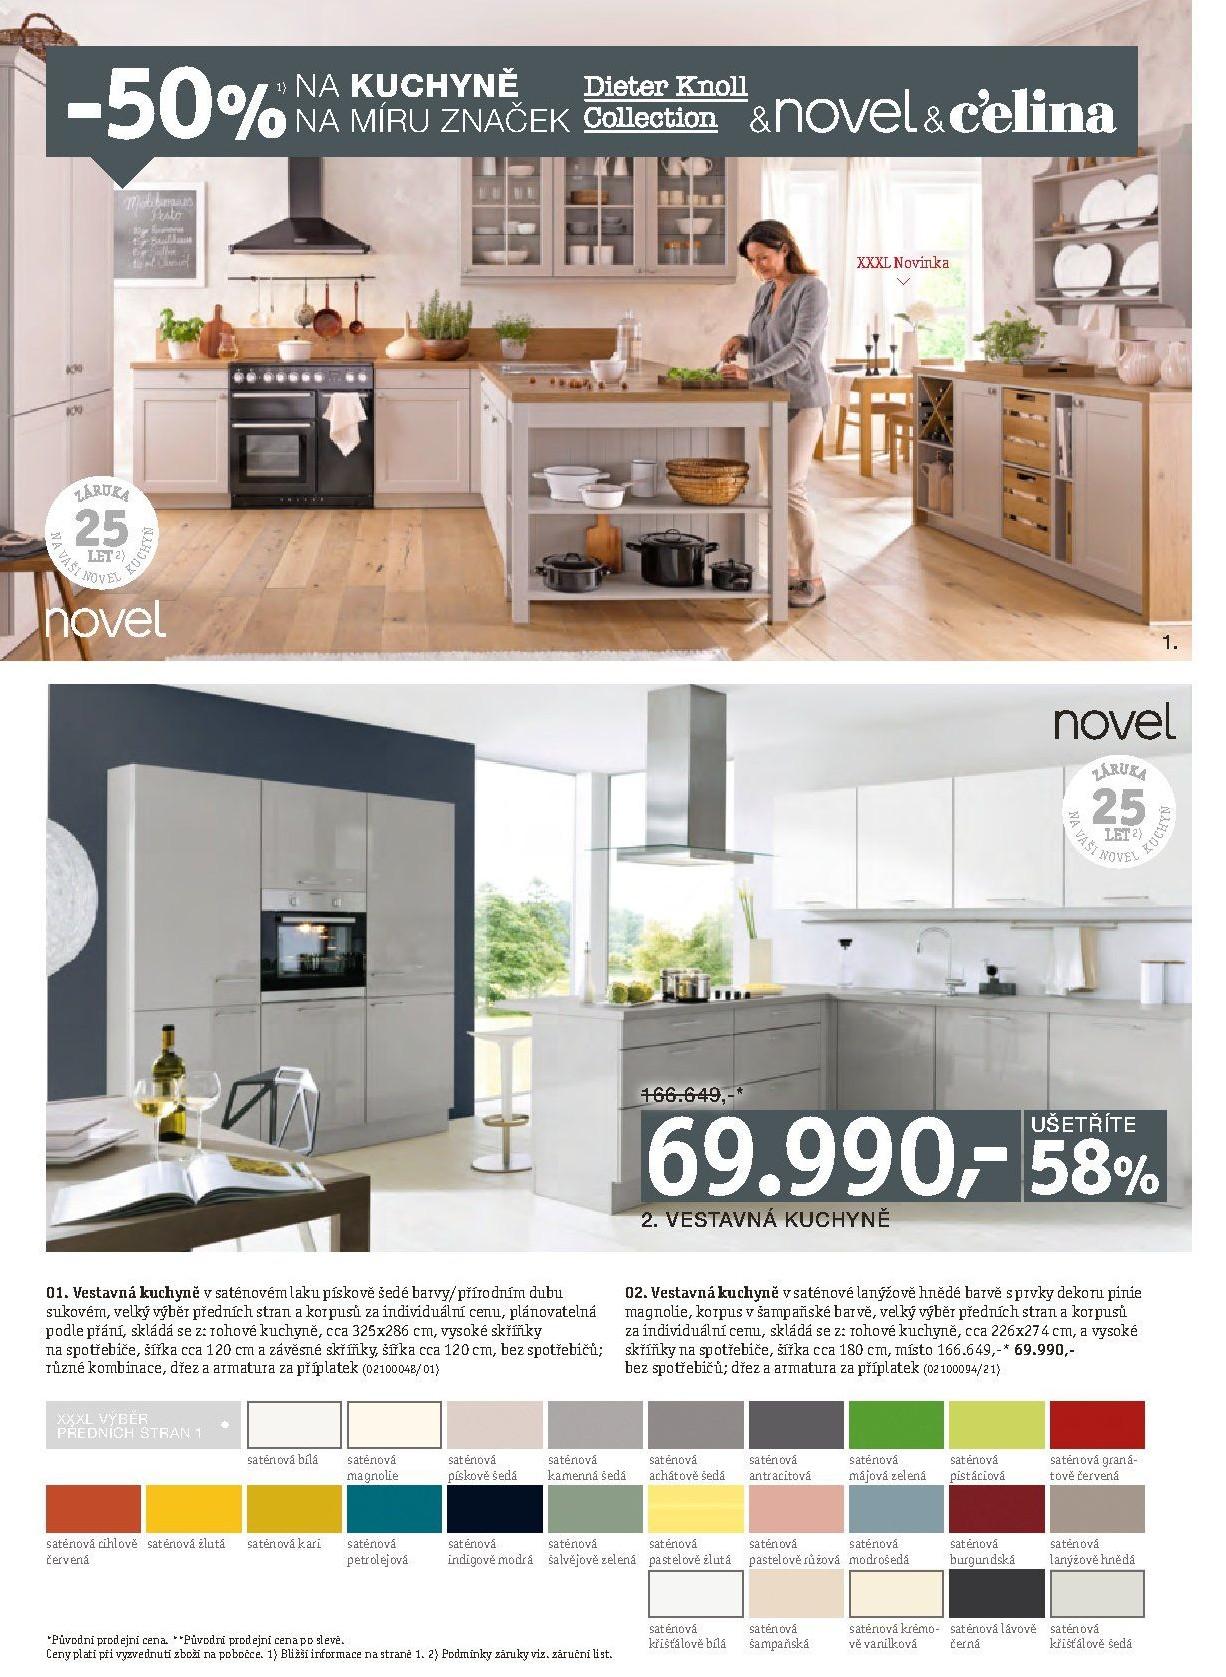 xxl lutz katalog stunning xxl gartenmobel gartenmabel de. Black Bedroom Furniture Sets. Home Design Ideas